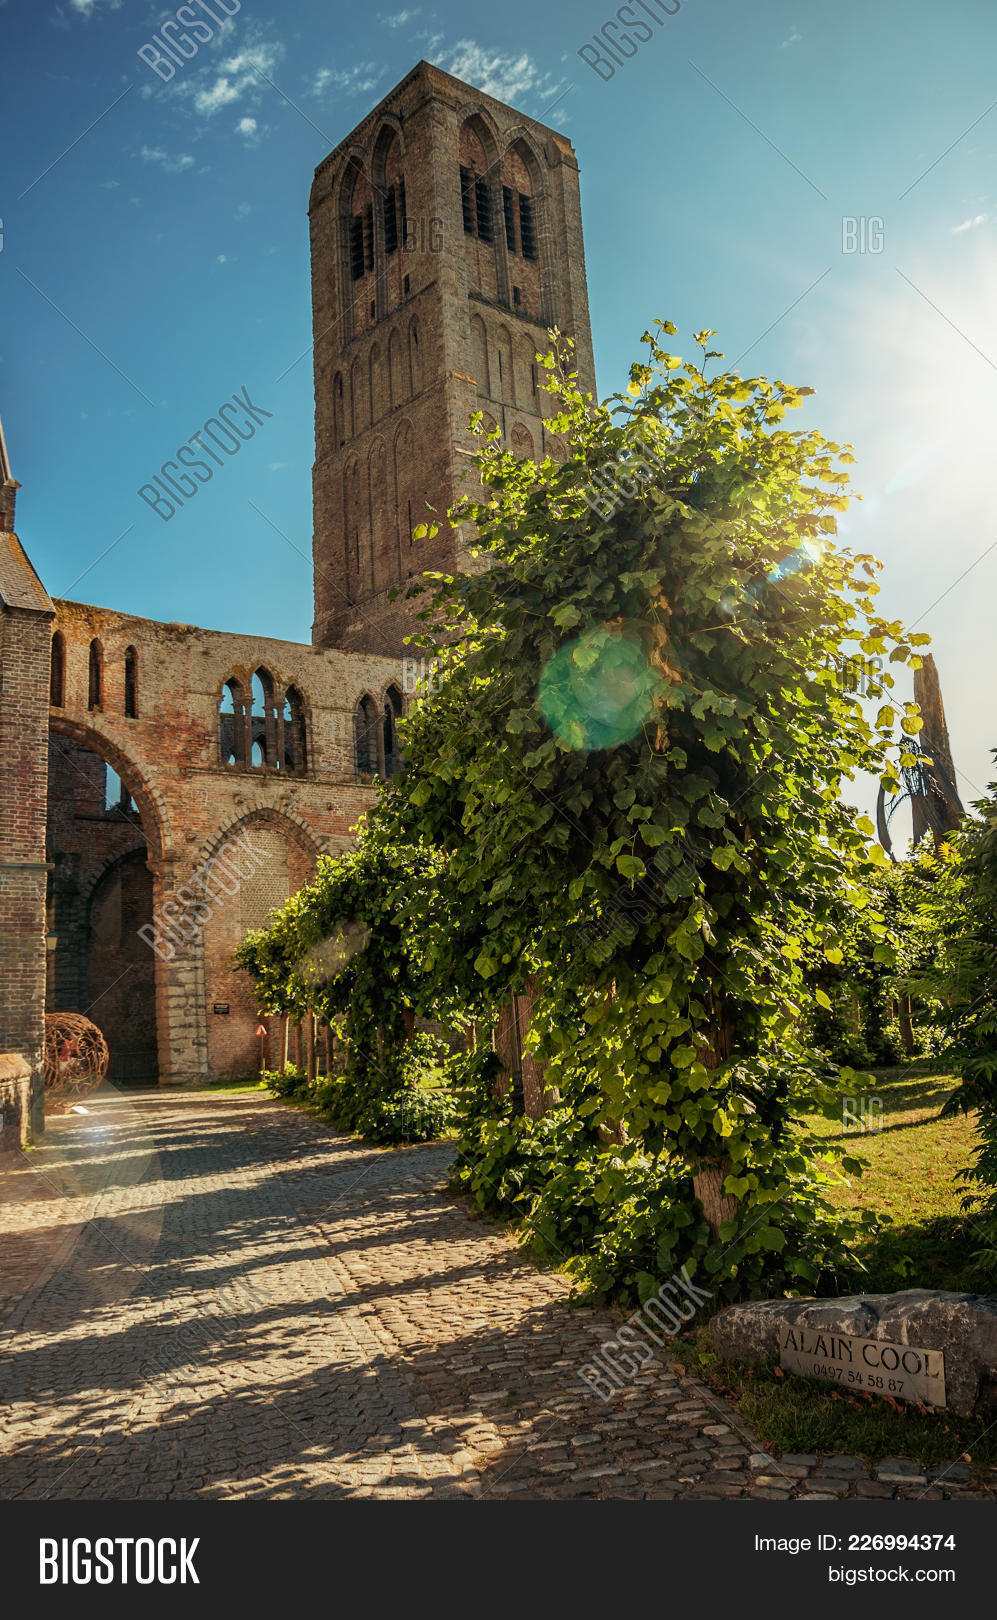 Pathway Trees Garden Image & Photo (Free Trial) | Bigstock